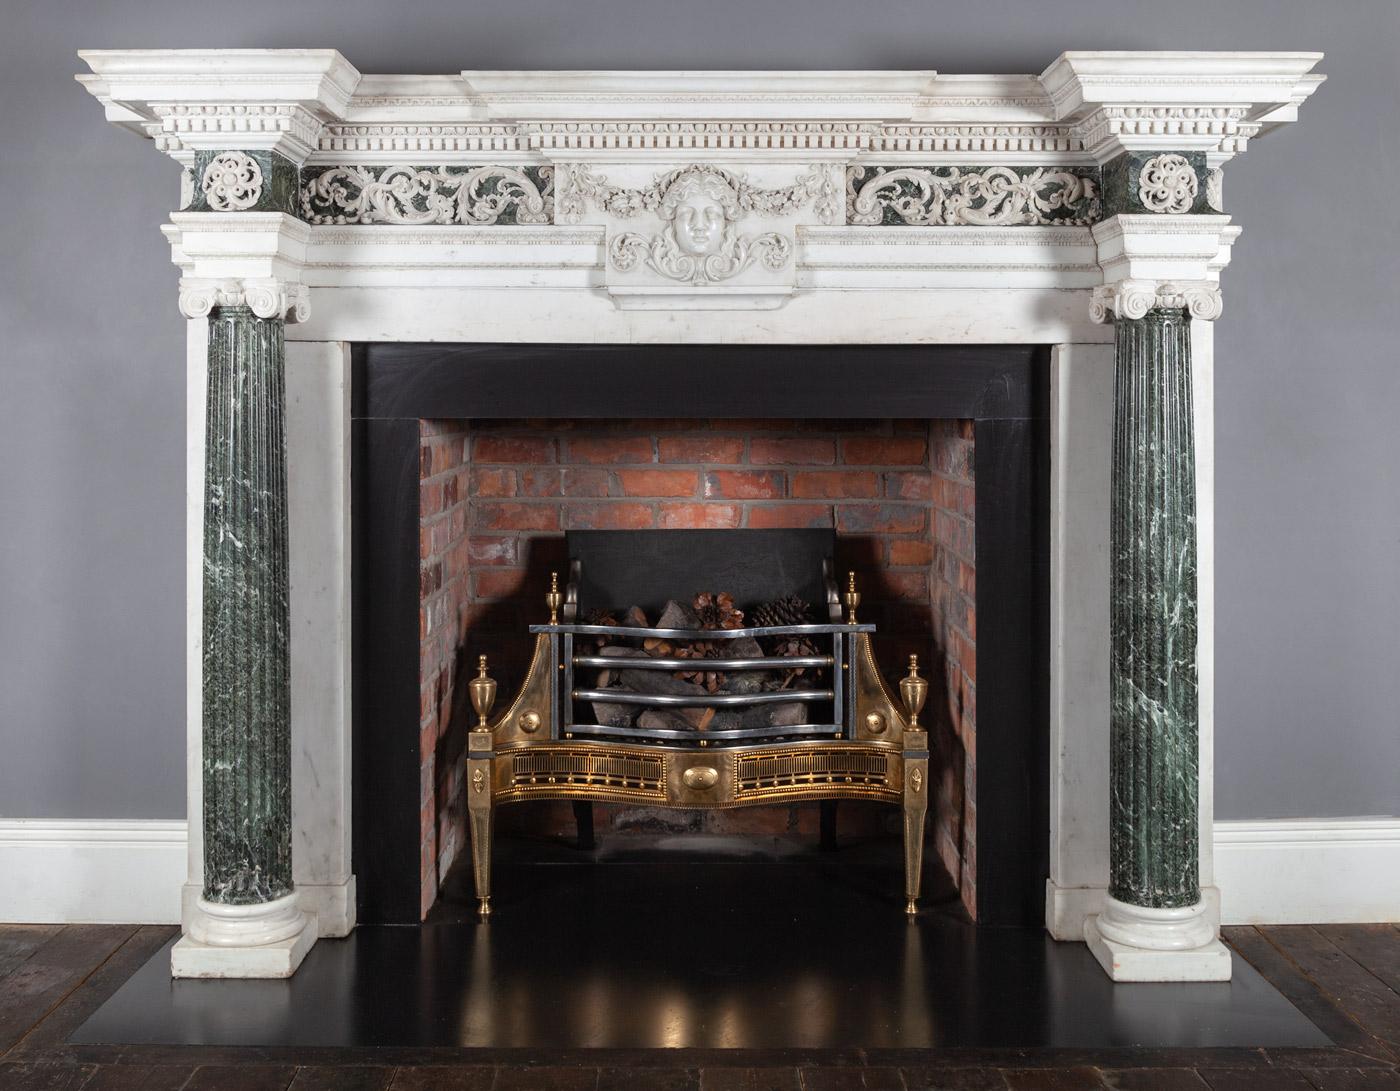 Isaac Ware Fireplace – 18121